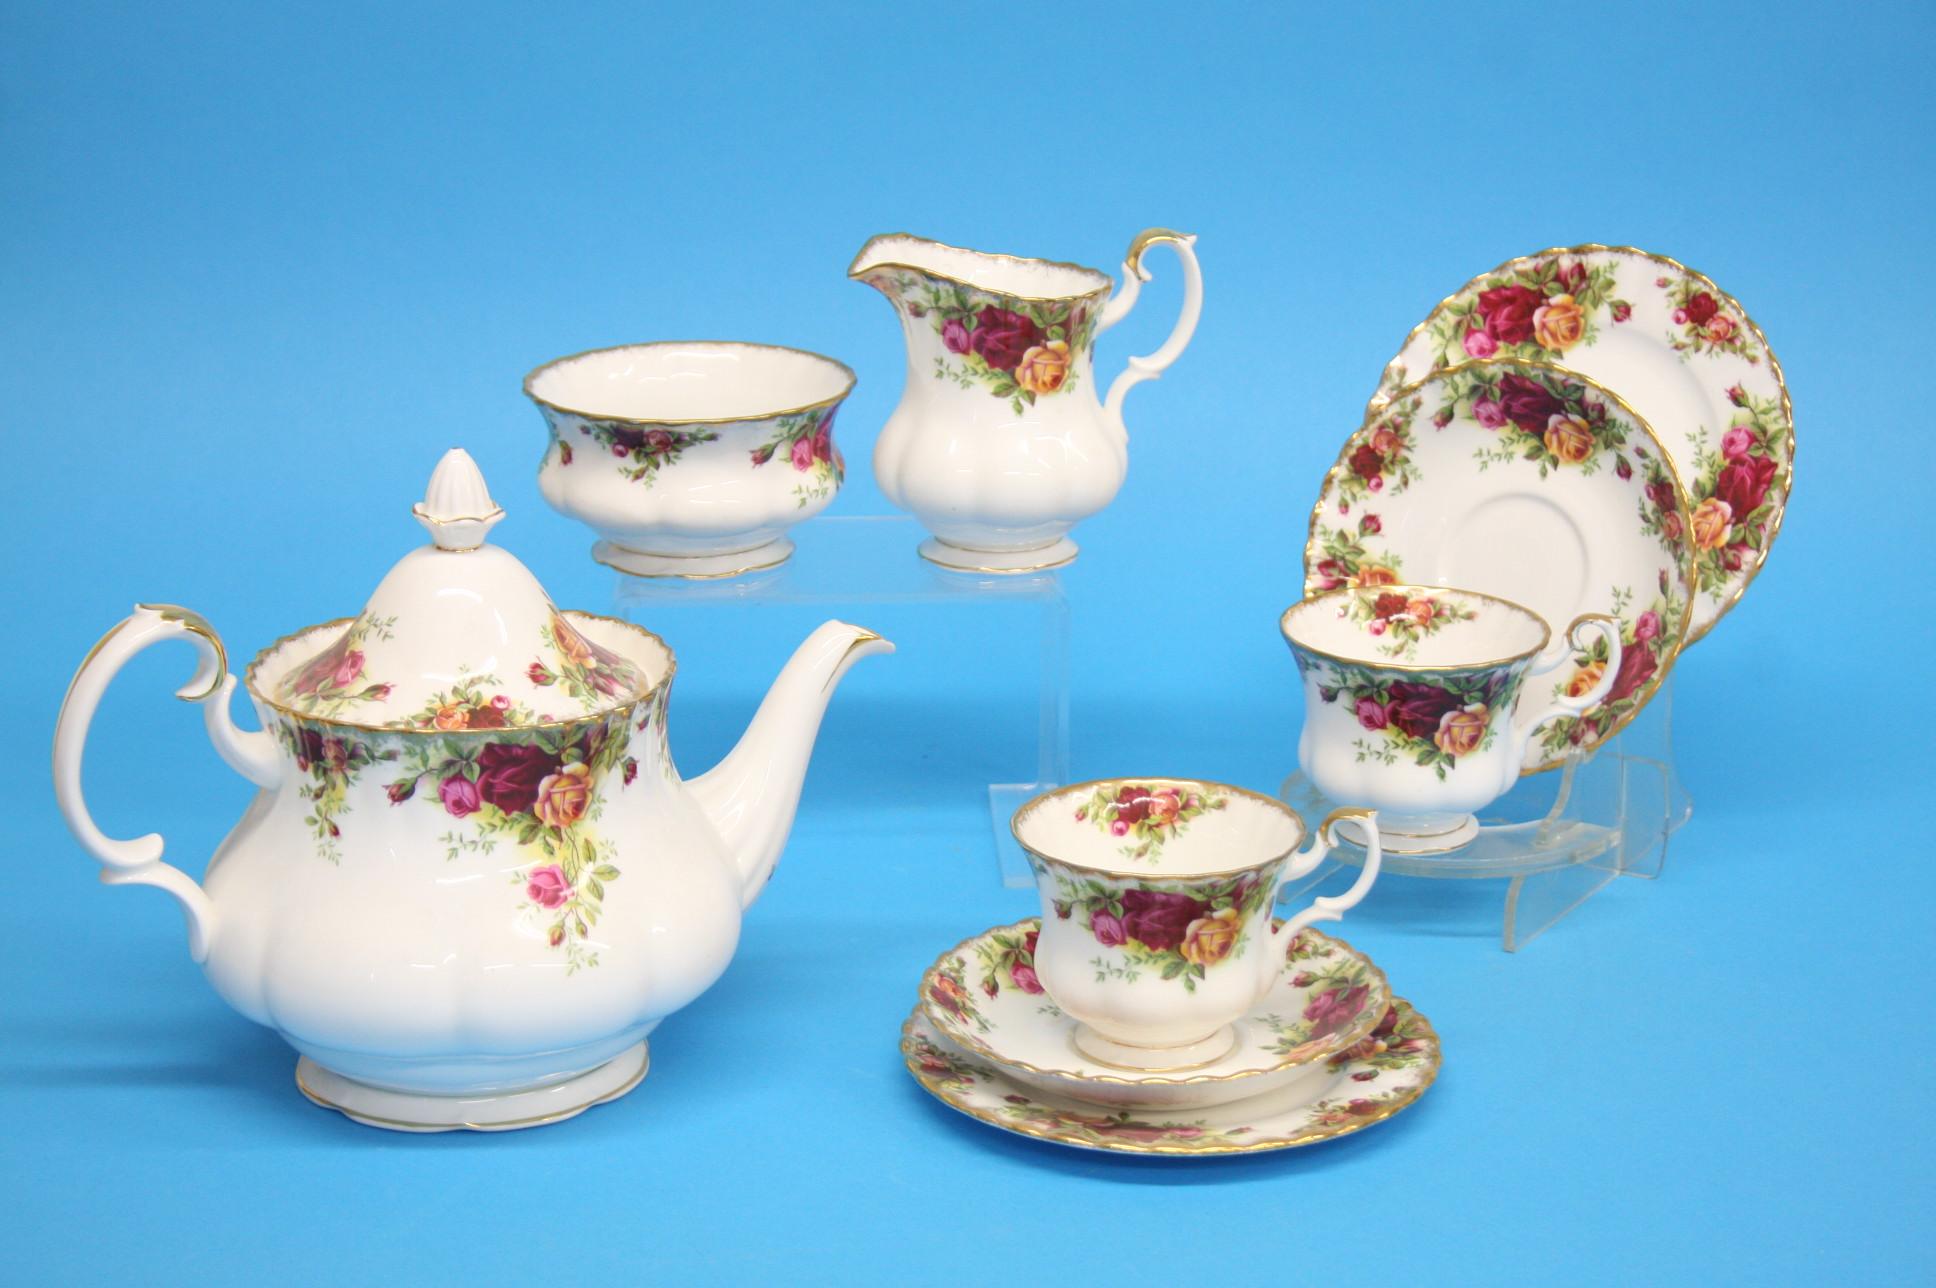 A Royal Albert Country Rose tea set